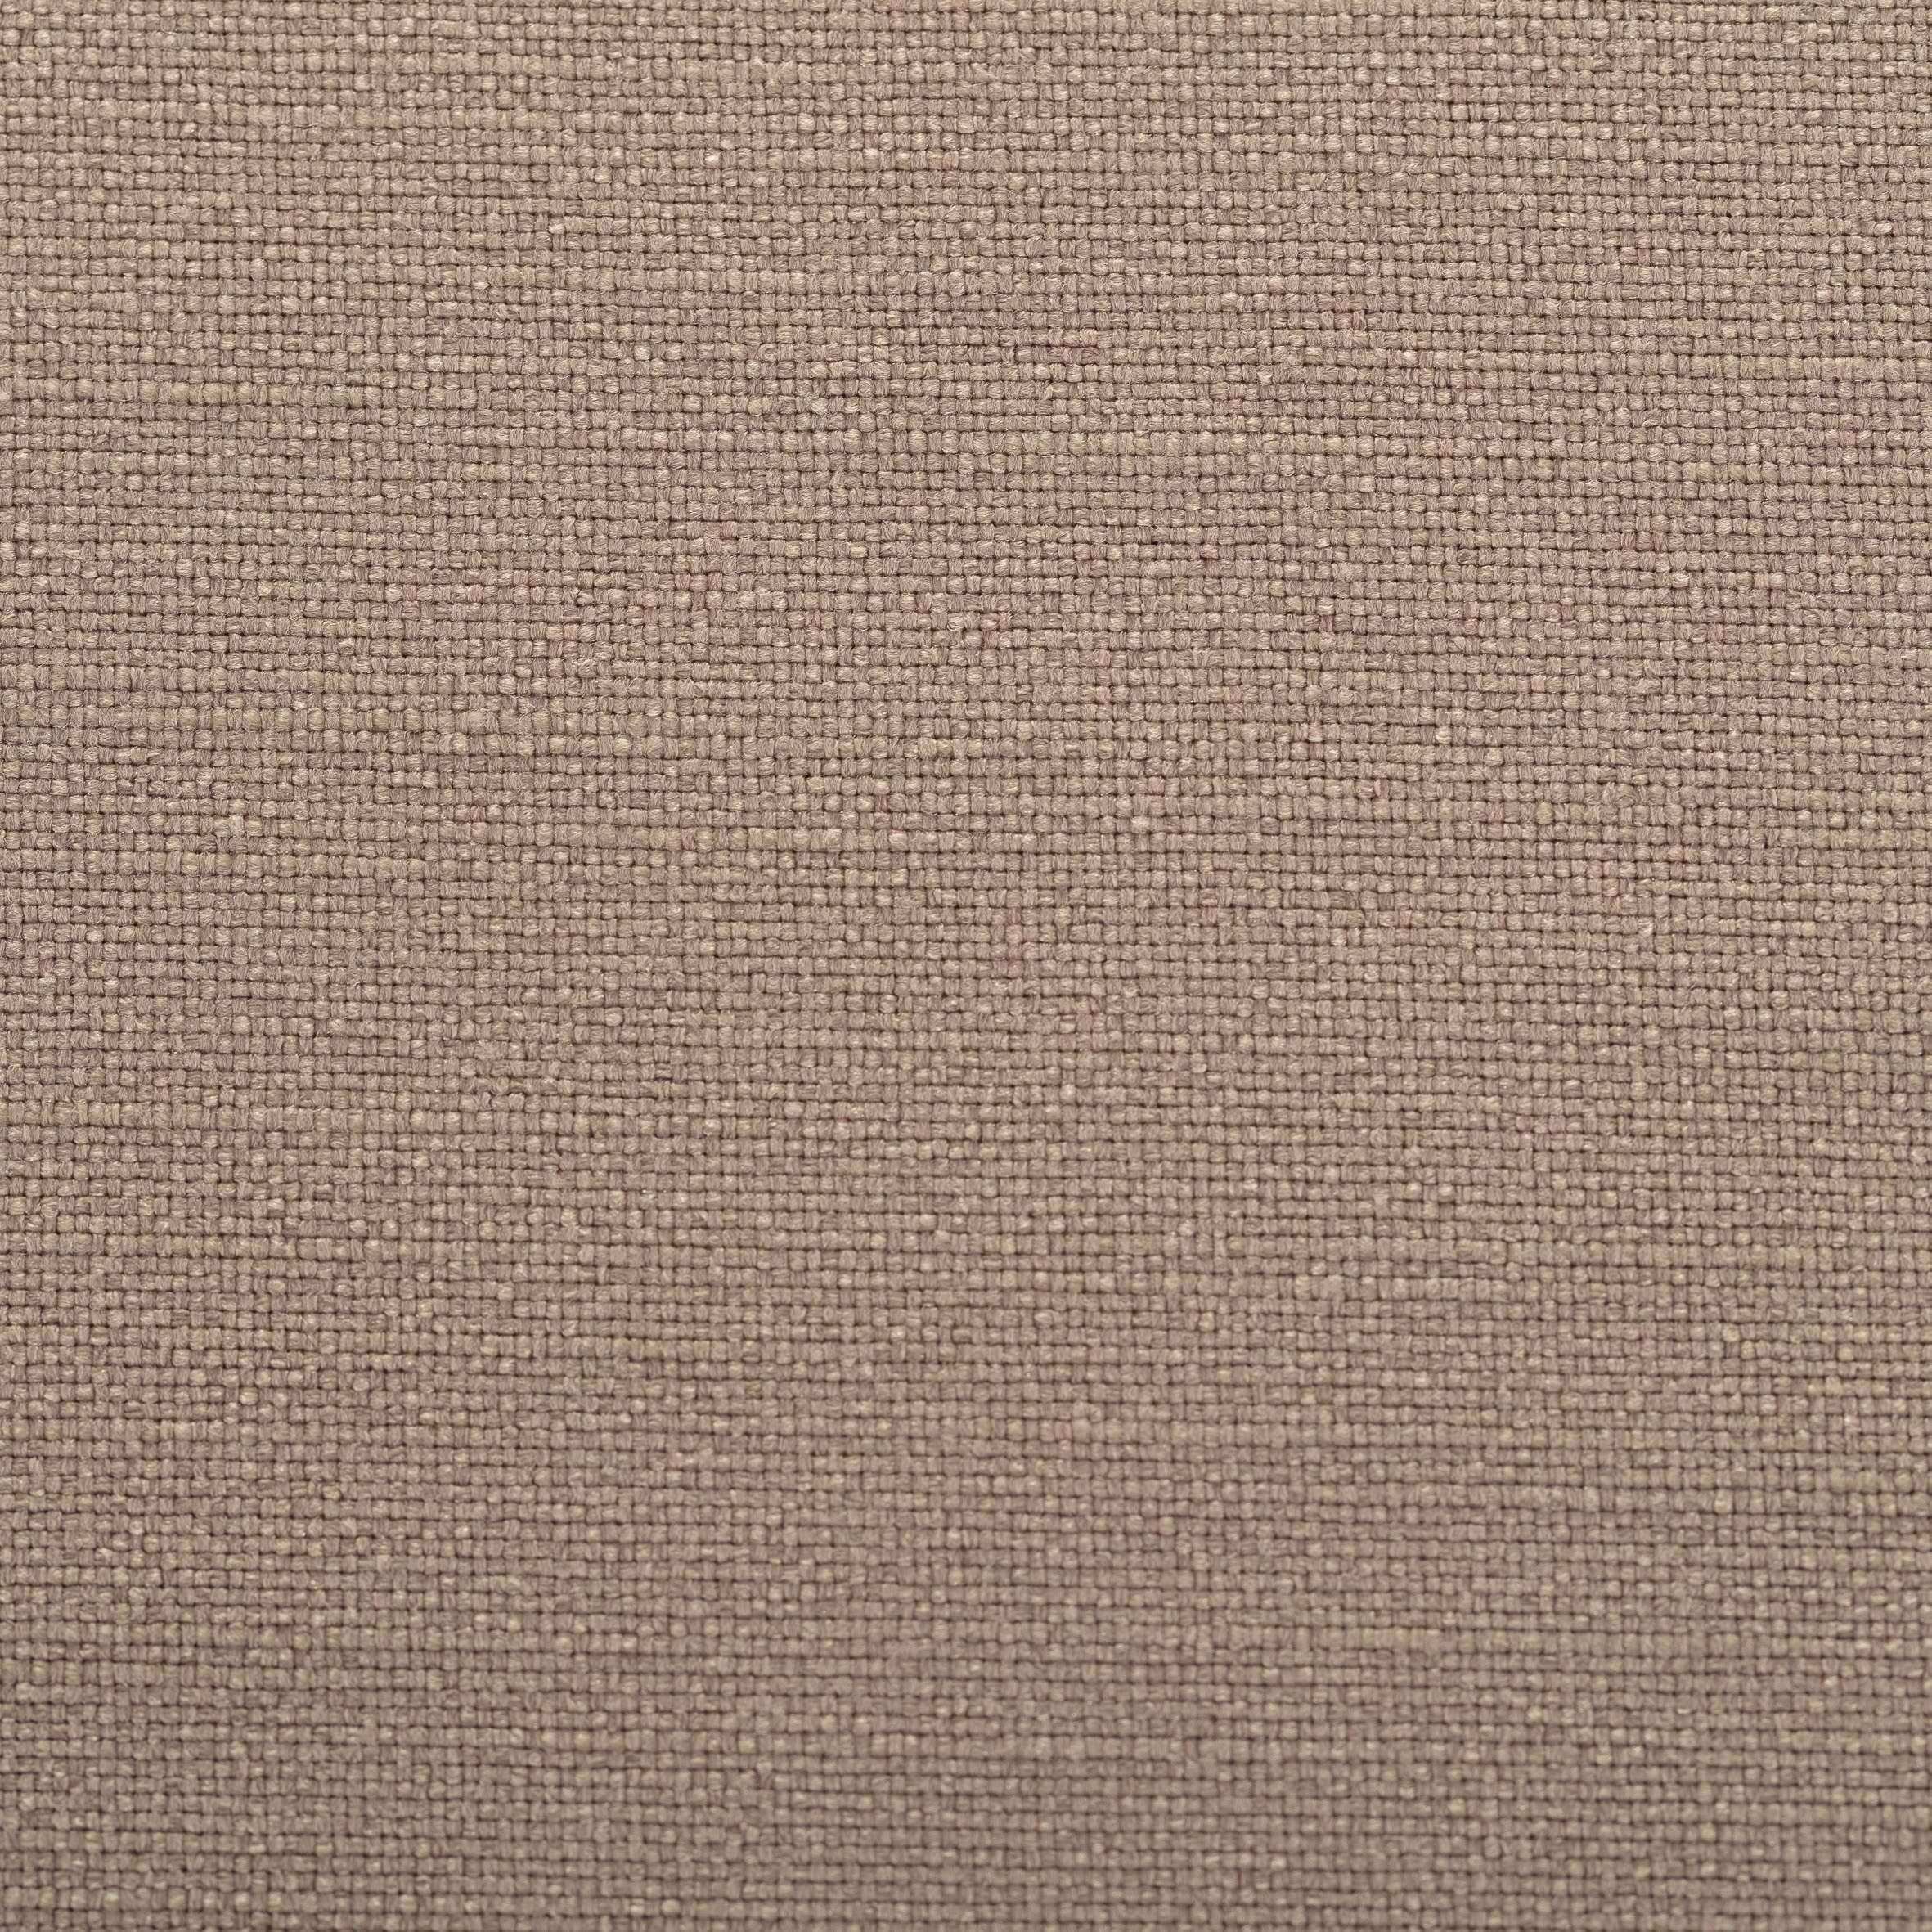 Kant en klaar gordijn BASIC met plooiband 140x280cm, graphite